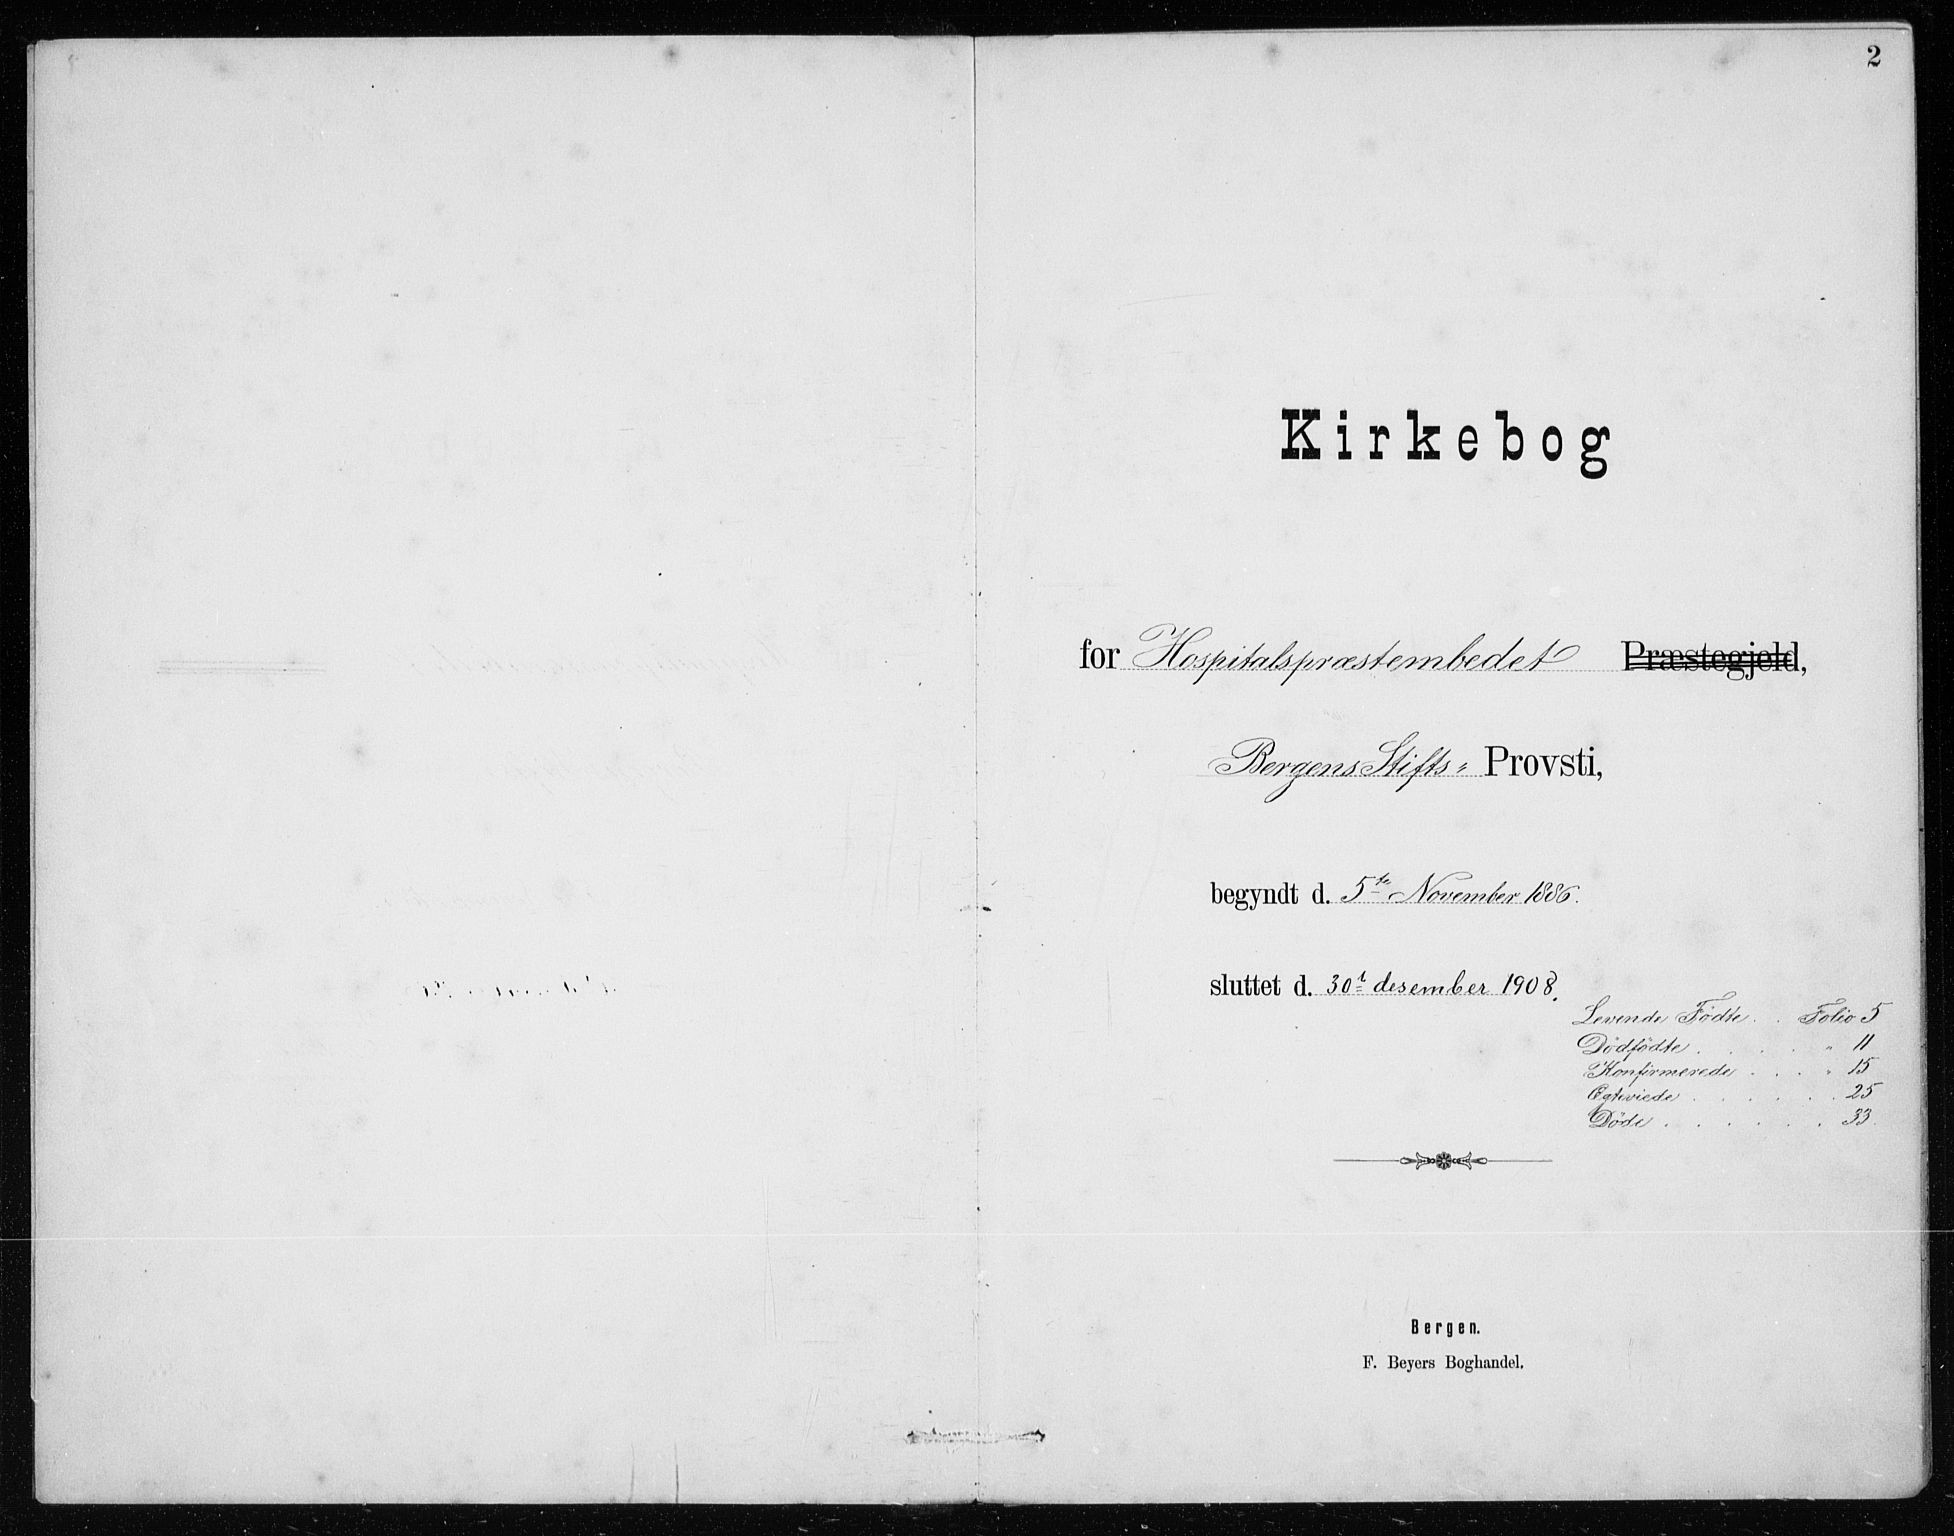 SAB, St. Jørgens hospital og Årstad sokneprestembete, Klokkerbok nr. A 10, 1886-1910, s. 2